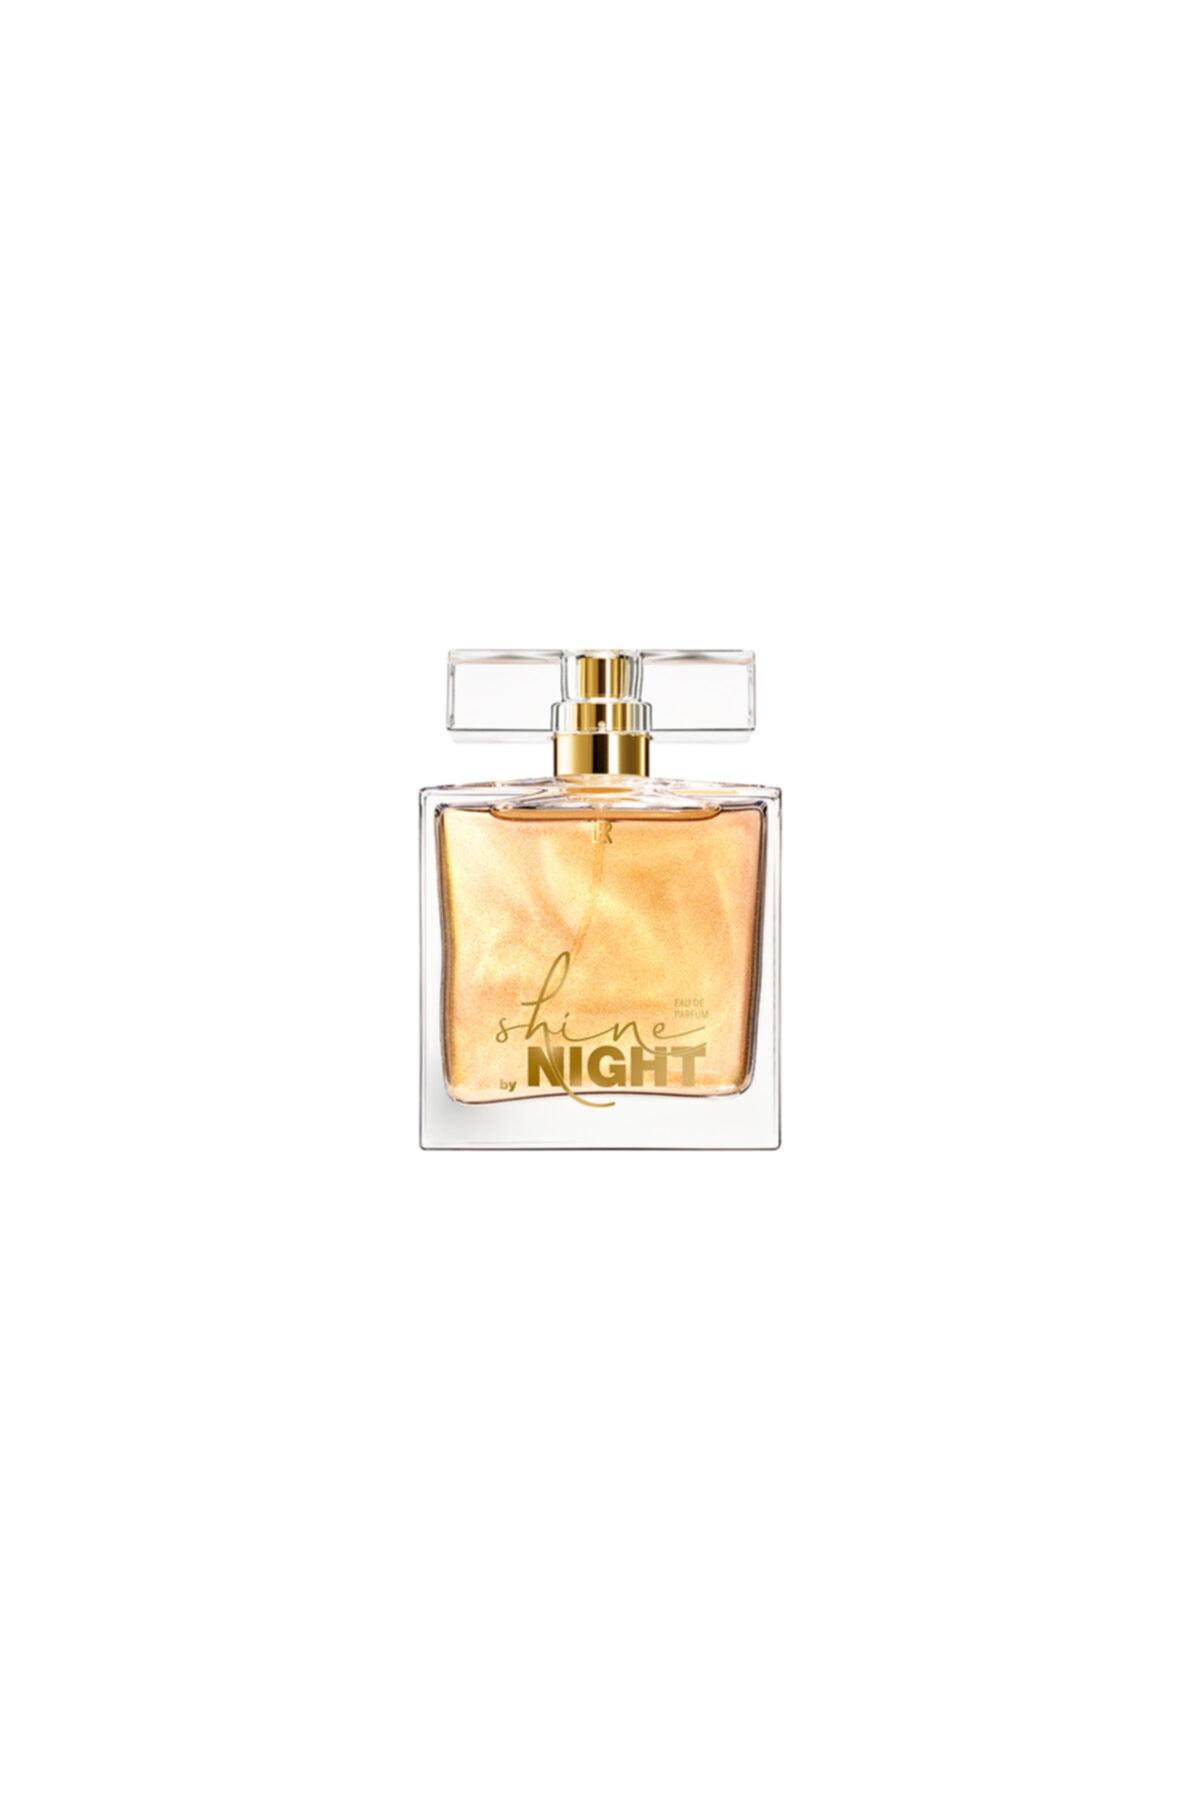 LR Shine By Night Edp 50 ml Kadın Parfüm SHİNENİGHT 1